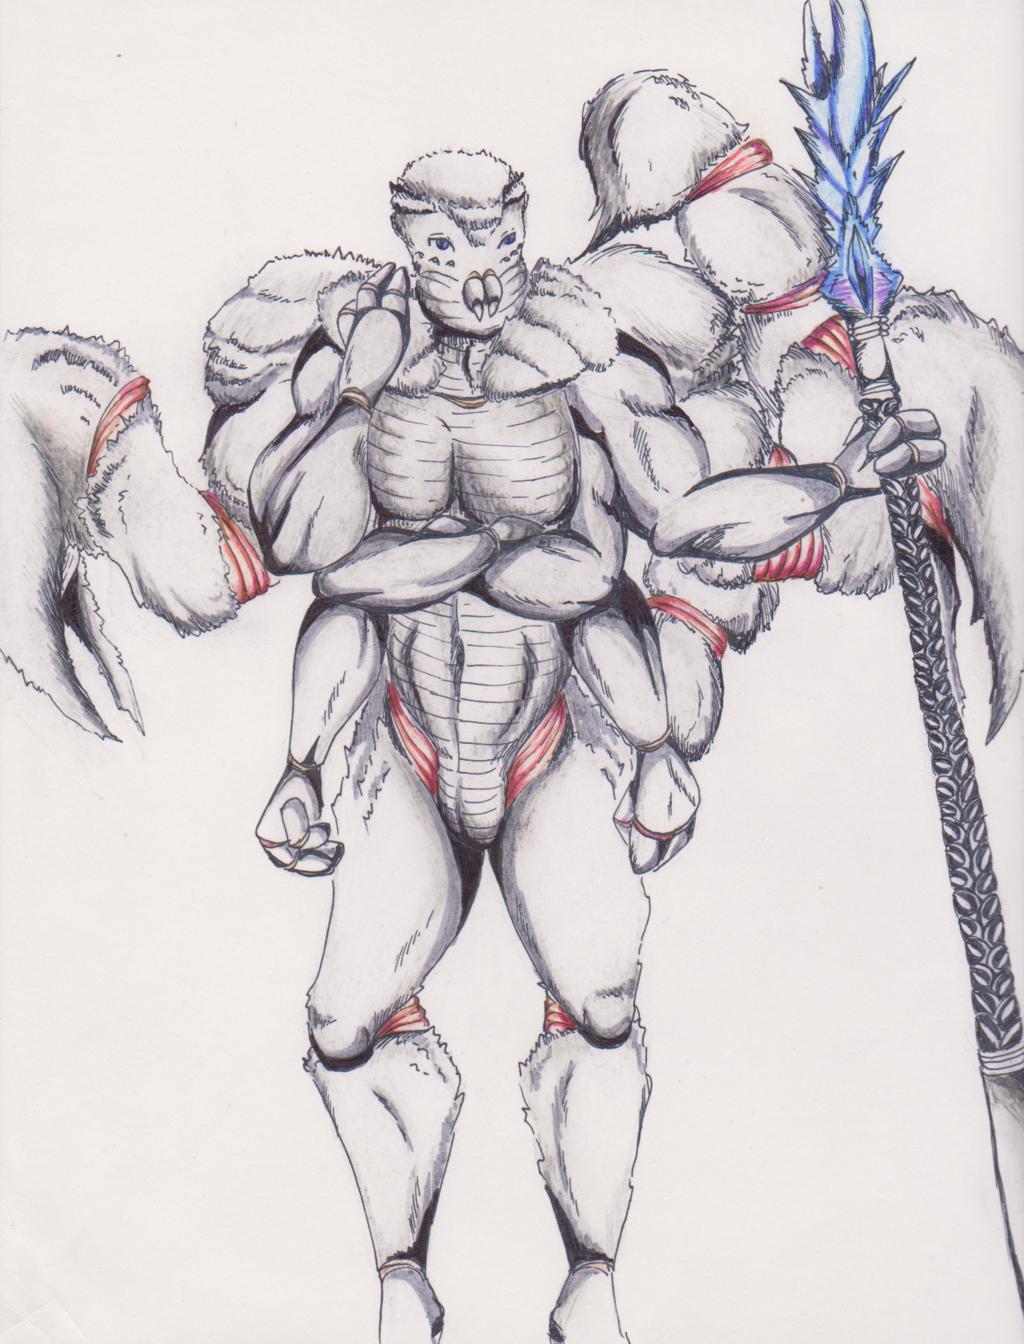 Most recent image: scorpion